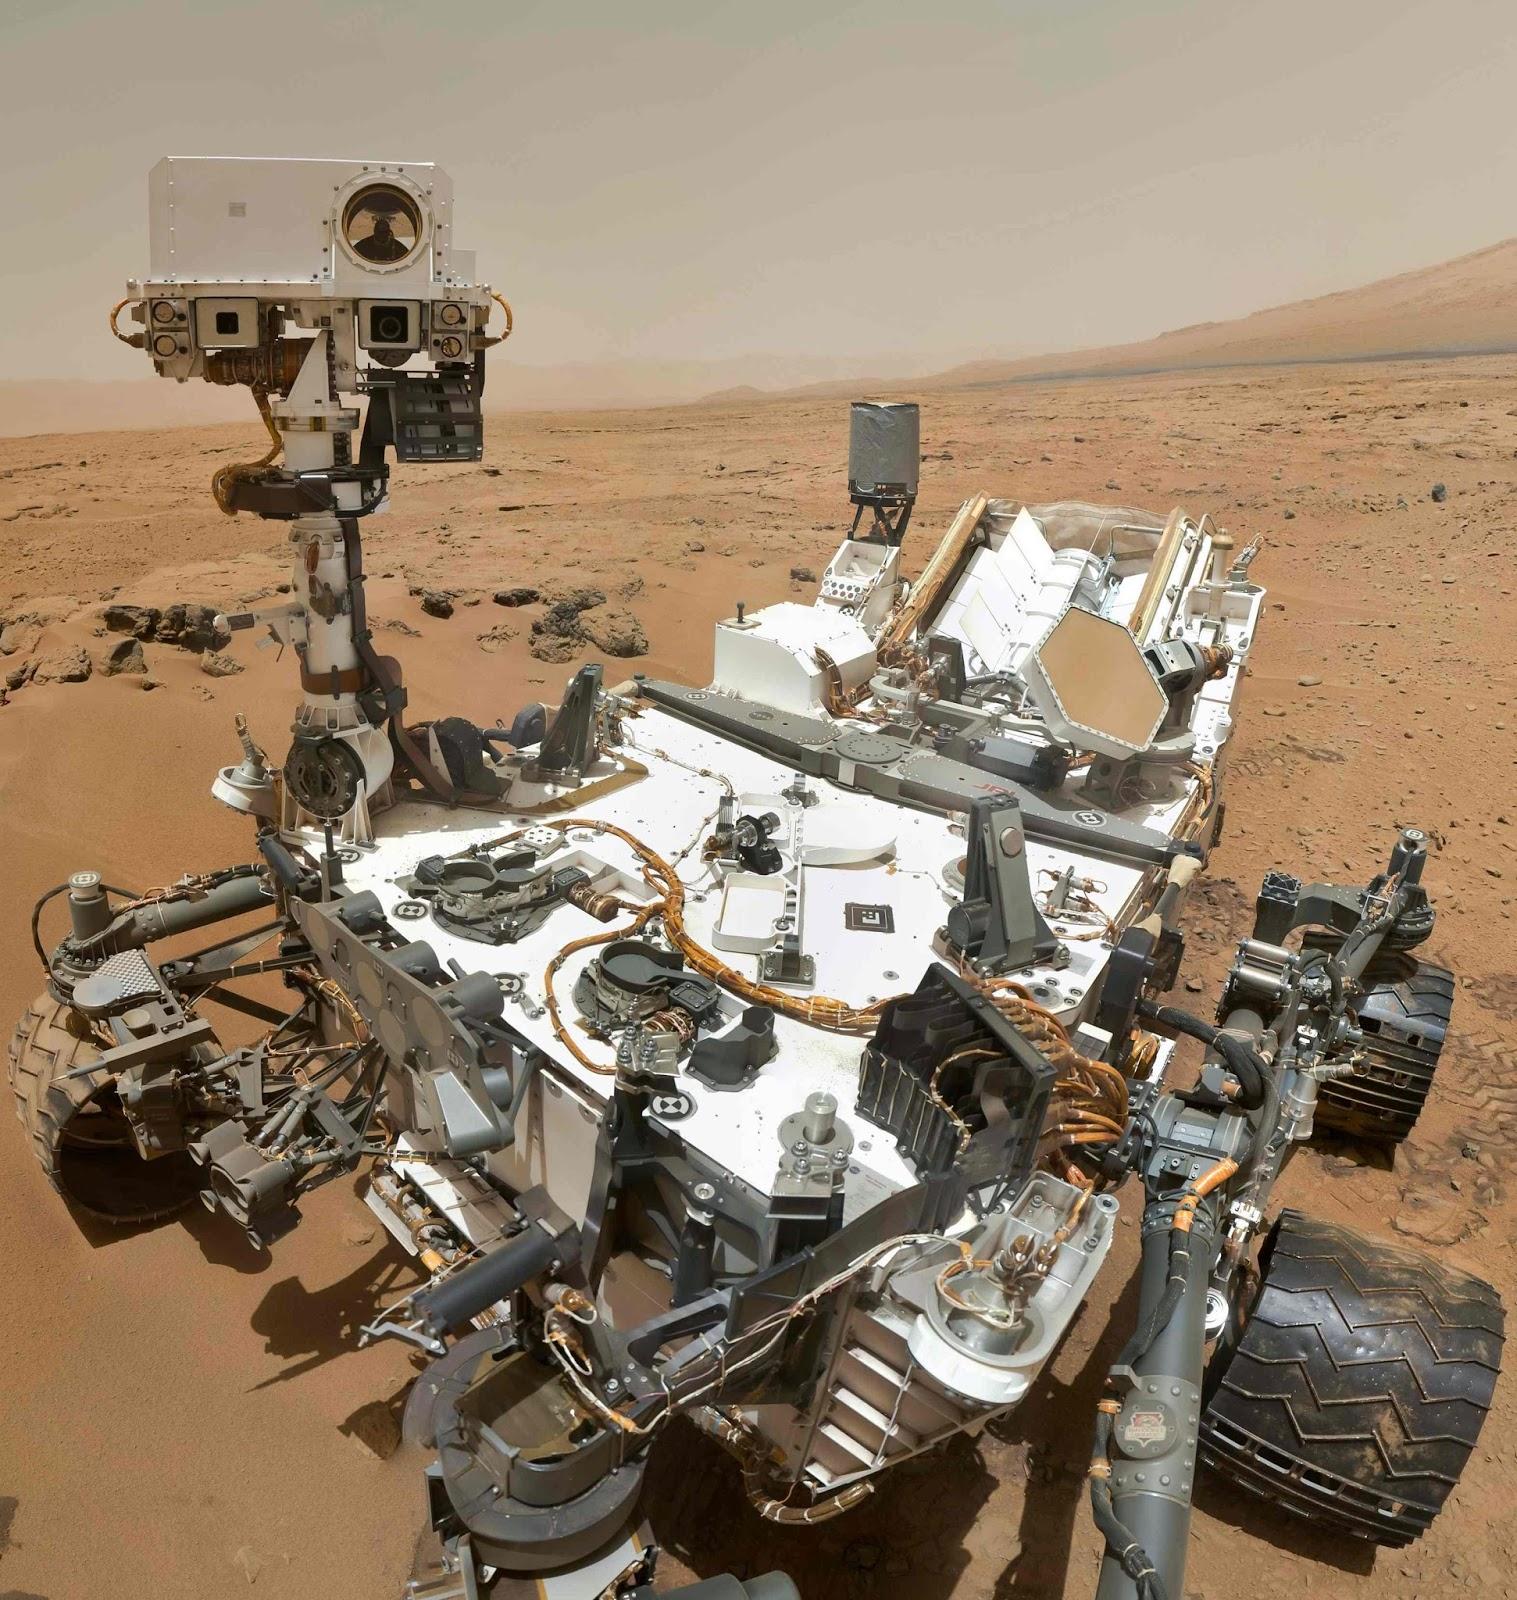 nasa robots on mars - photo #7